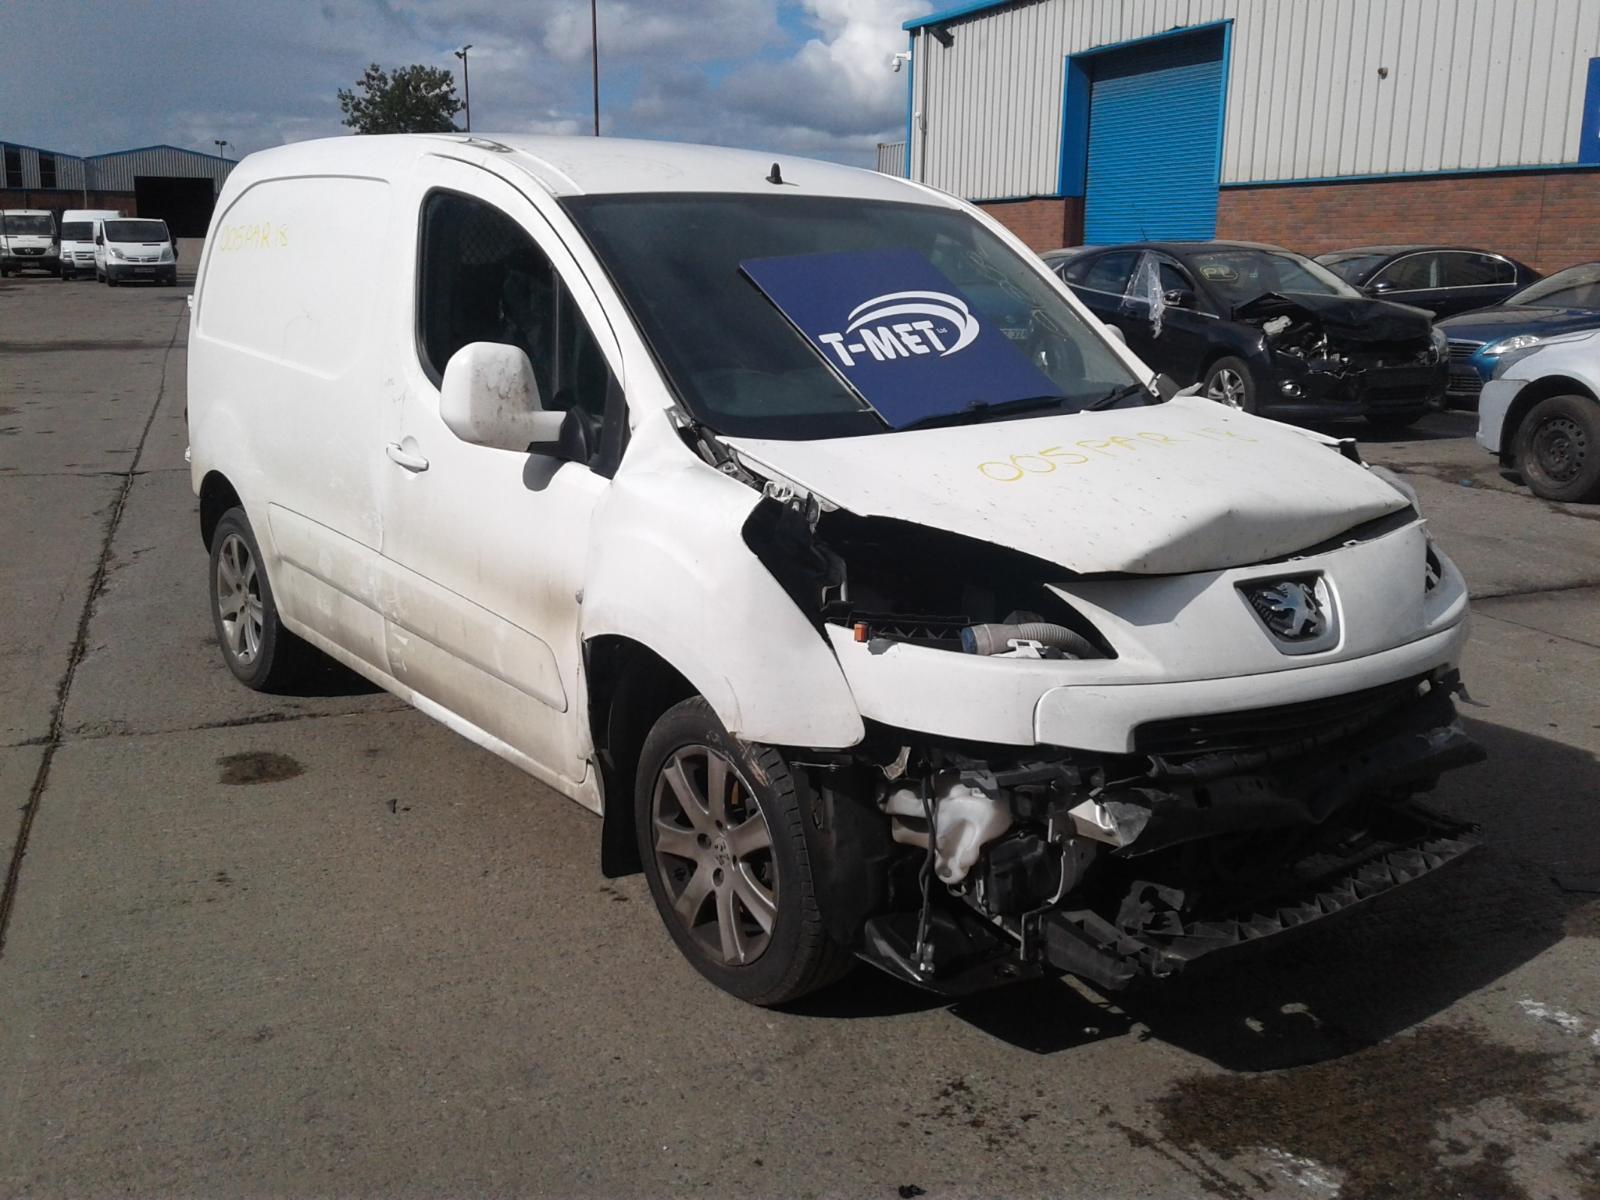 2012 Peugeot PARTNER HDI PROFESSIONAL L1 850 Image